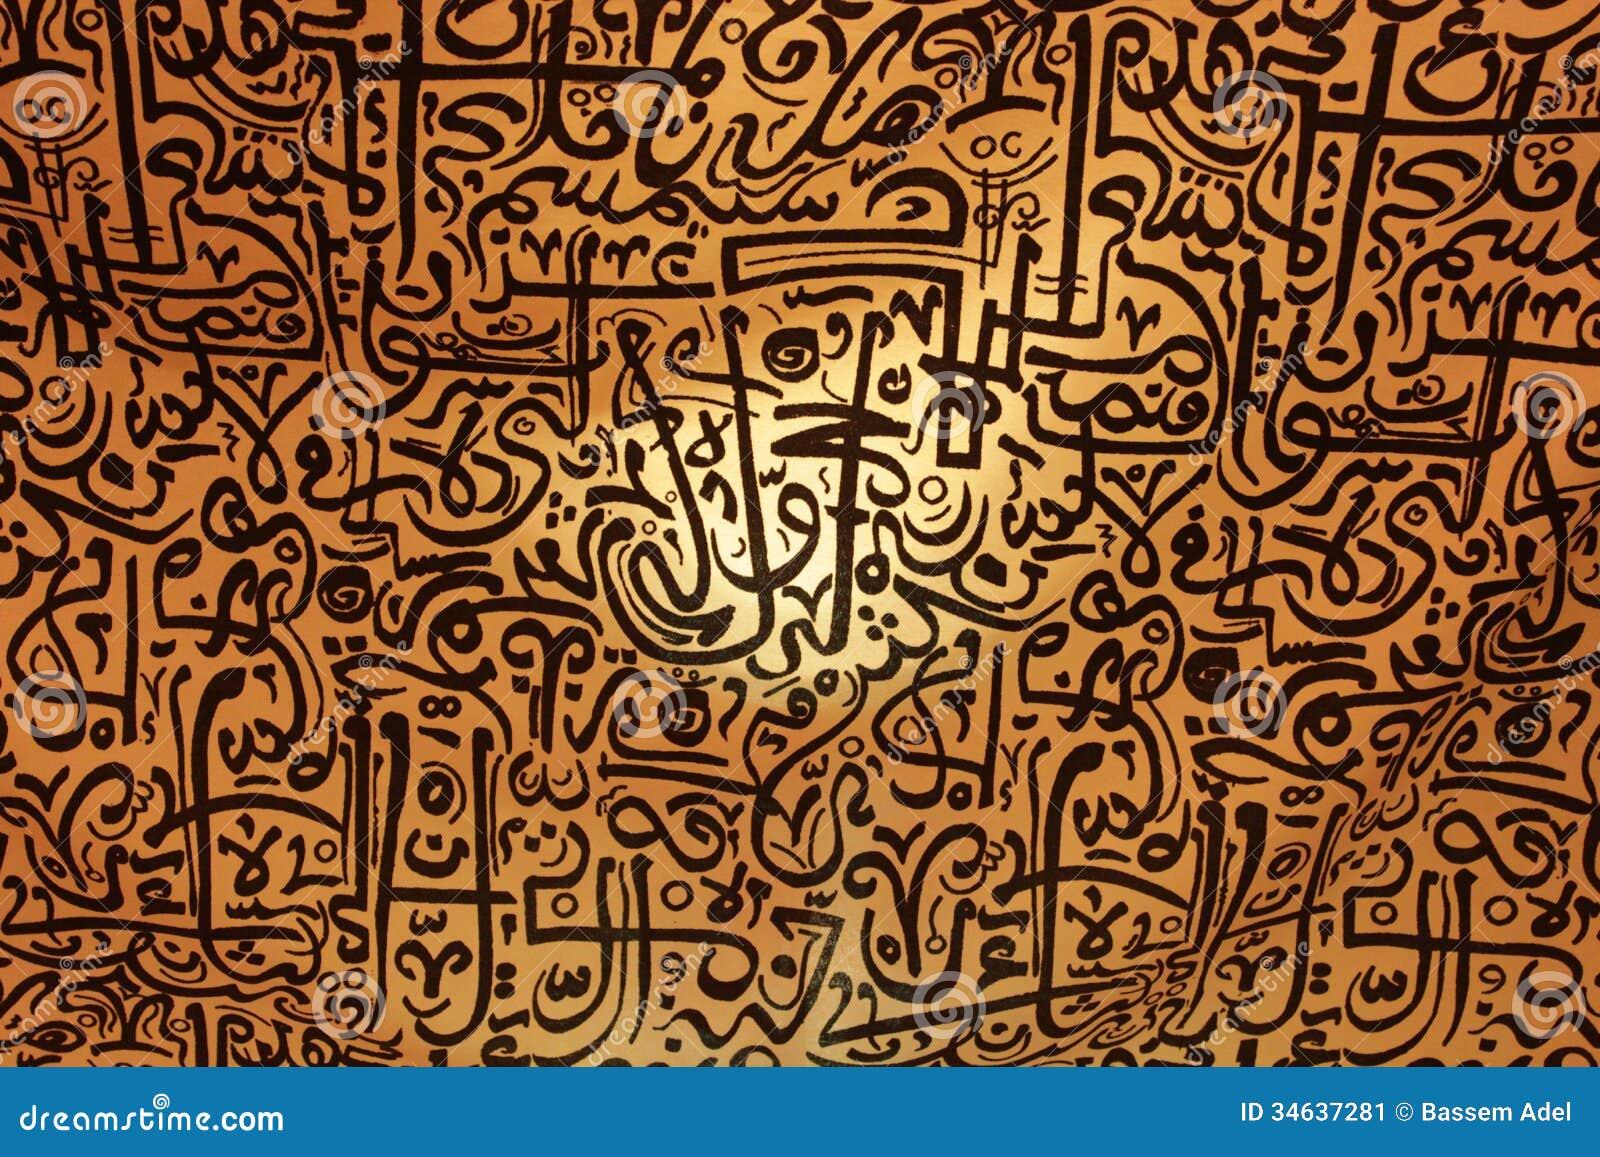 Islamic Art Stock Image  34637281